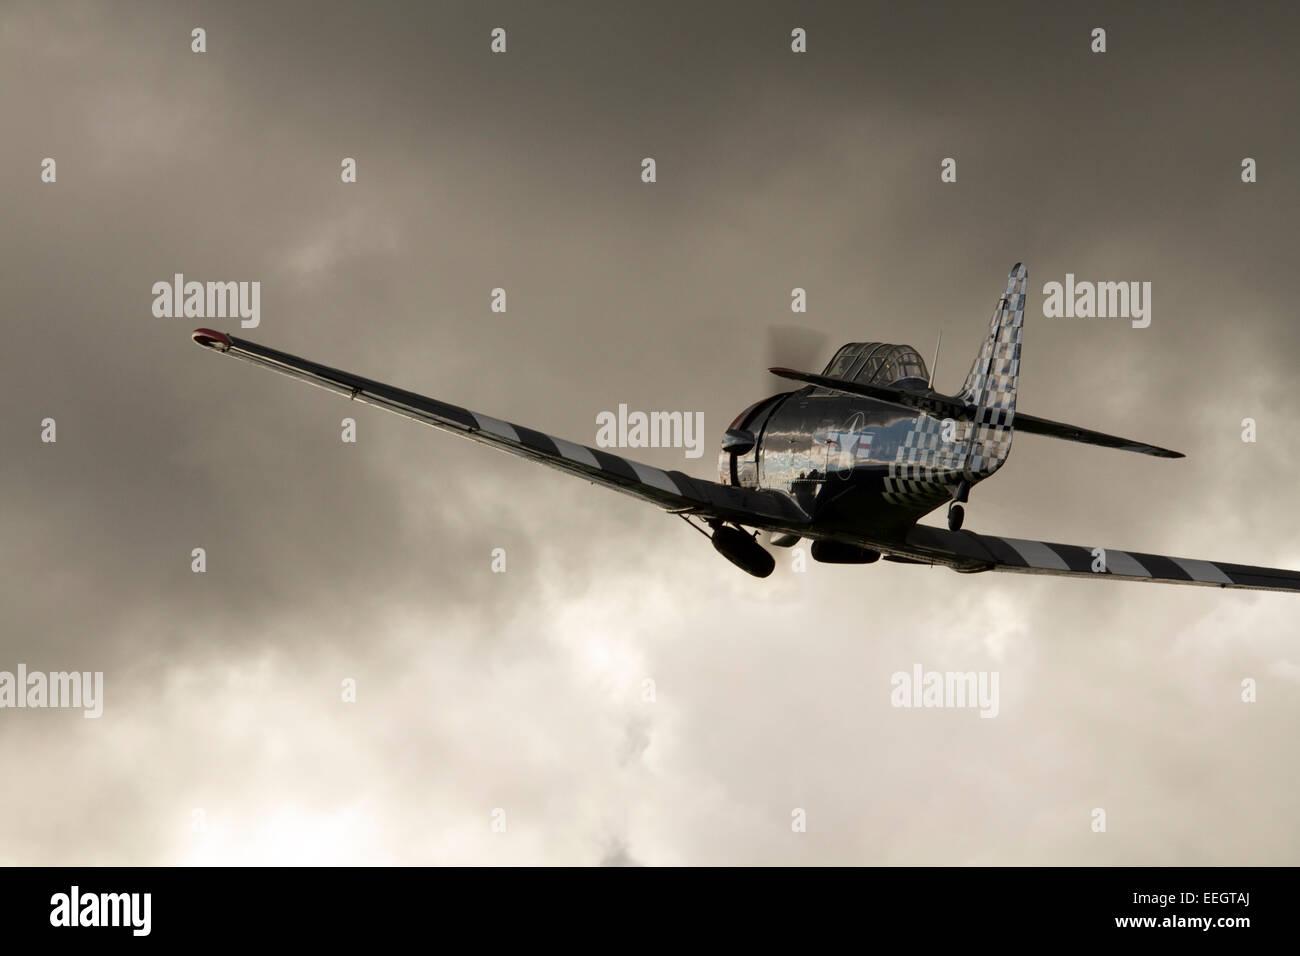 North American T-6 Texan - Stock Image